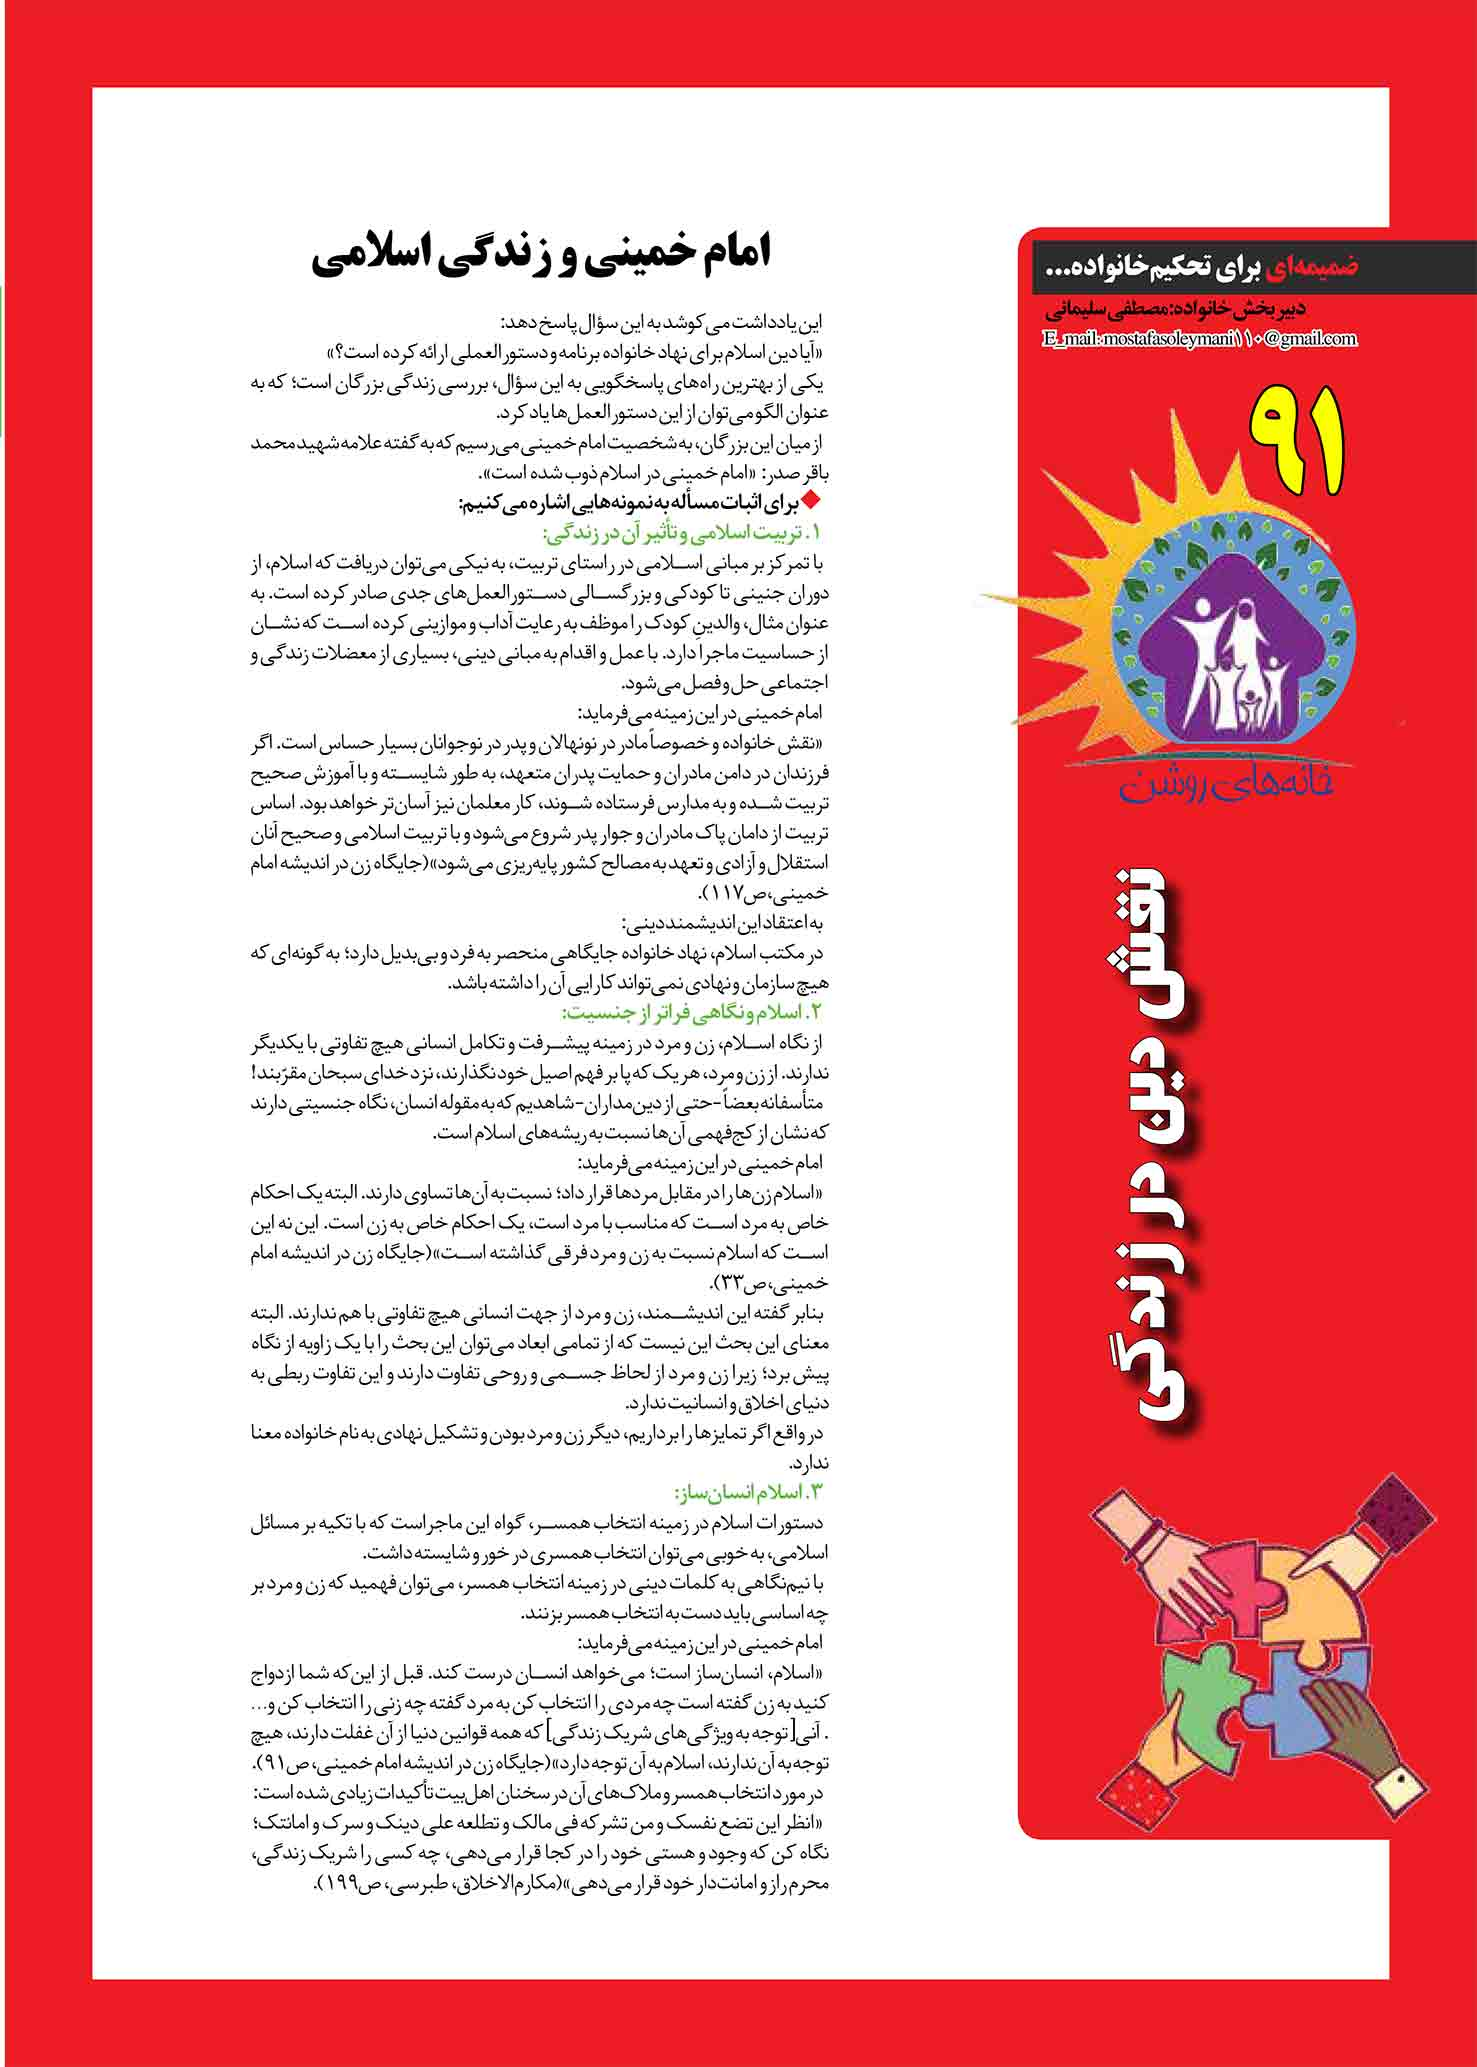 C:\Users\a.khalojini.ICPIKW\Desktop\391\New folder\@harim_emam391-28.jpg